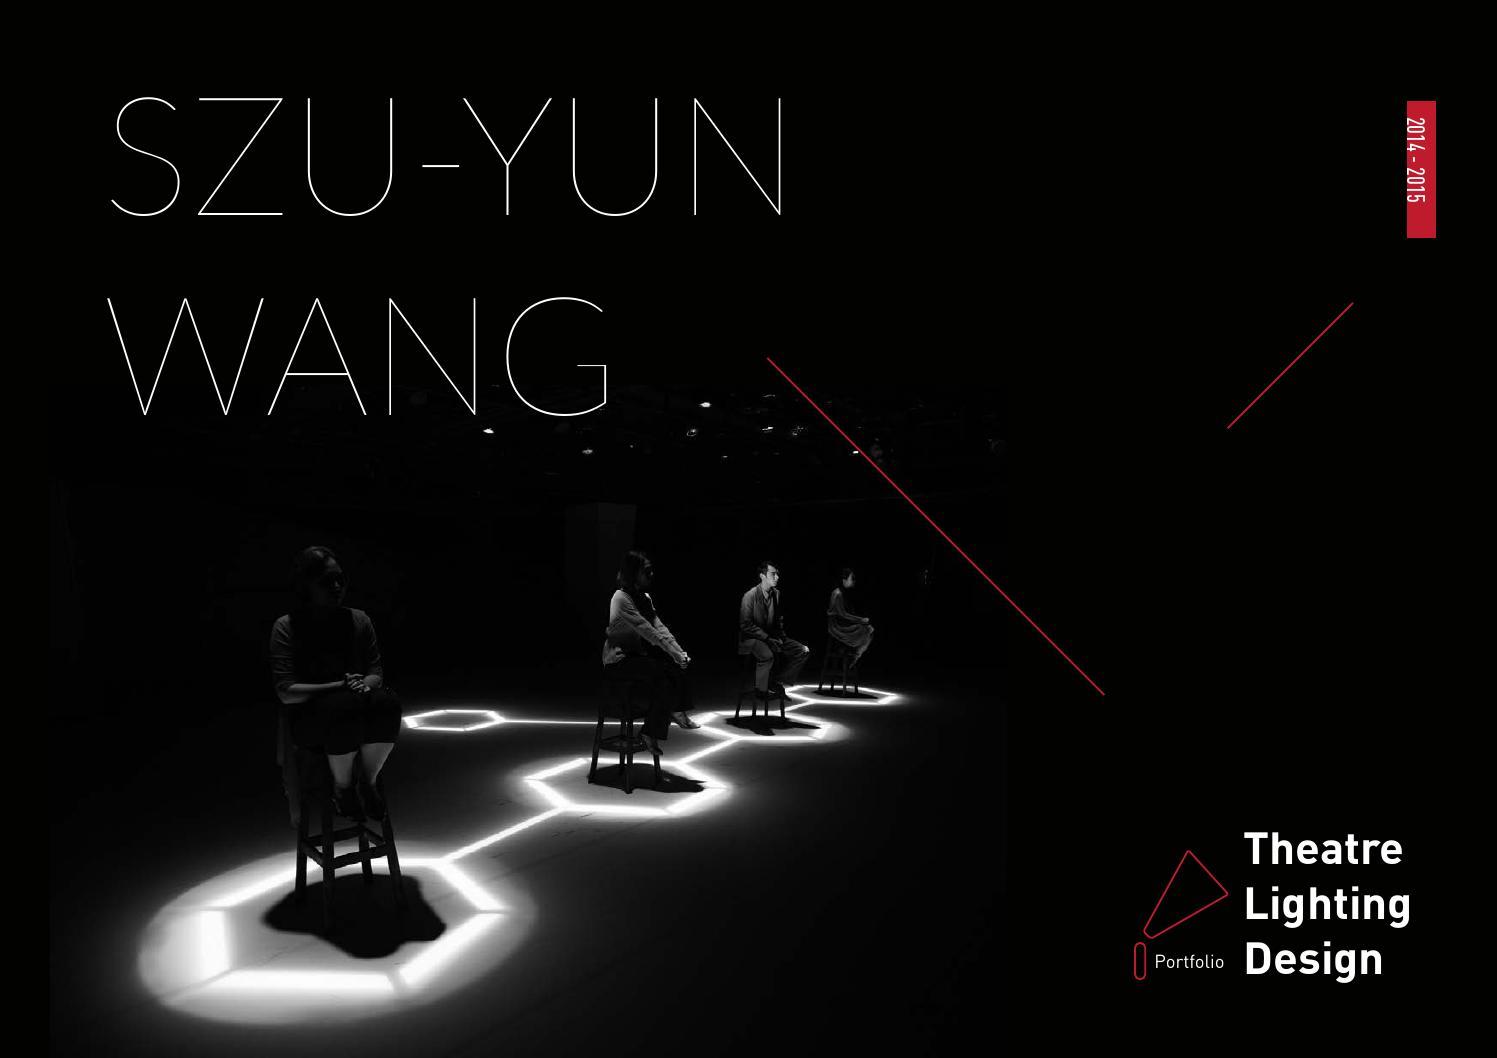 Szu Yun Theatre Lighting Design Portfolio By Celine